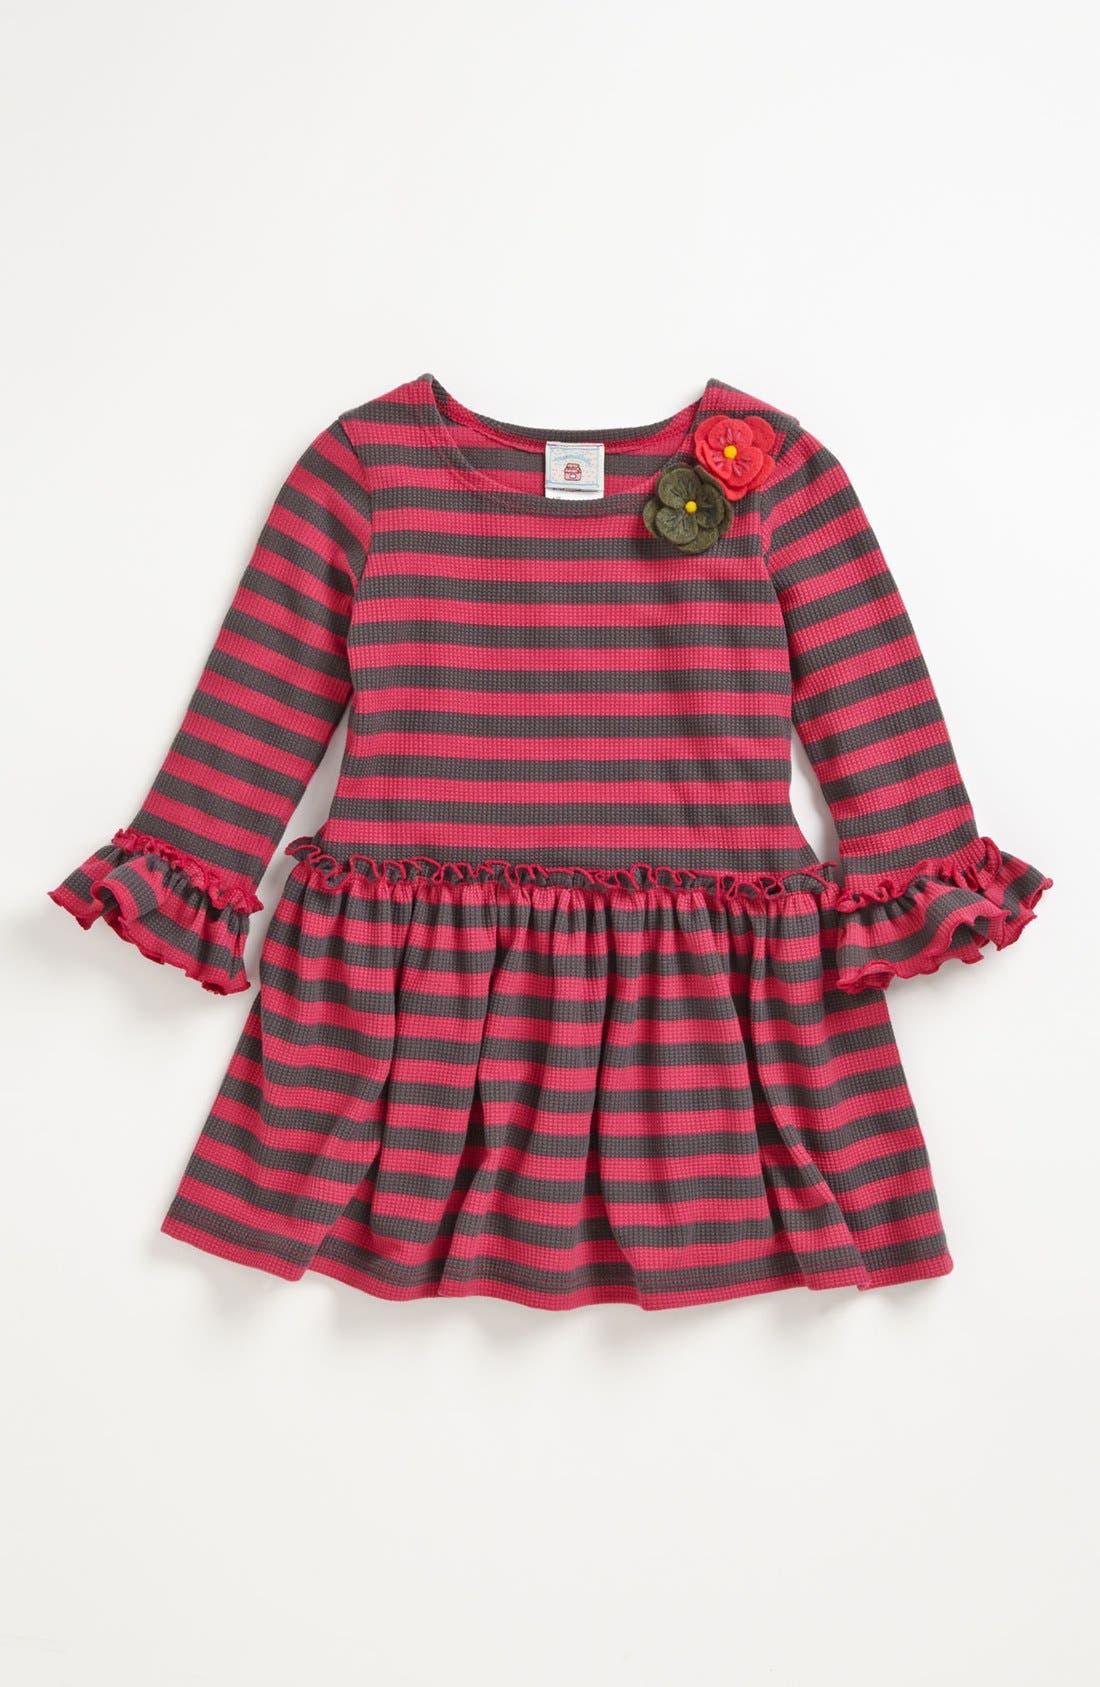 Alternate Image 1 Selected - Pippa & Julie Thermal Stripe Dress (Toddler Girls)